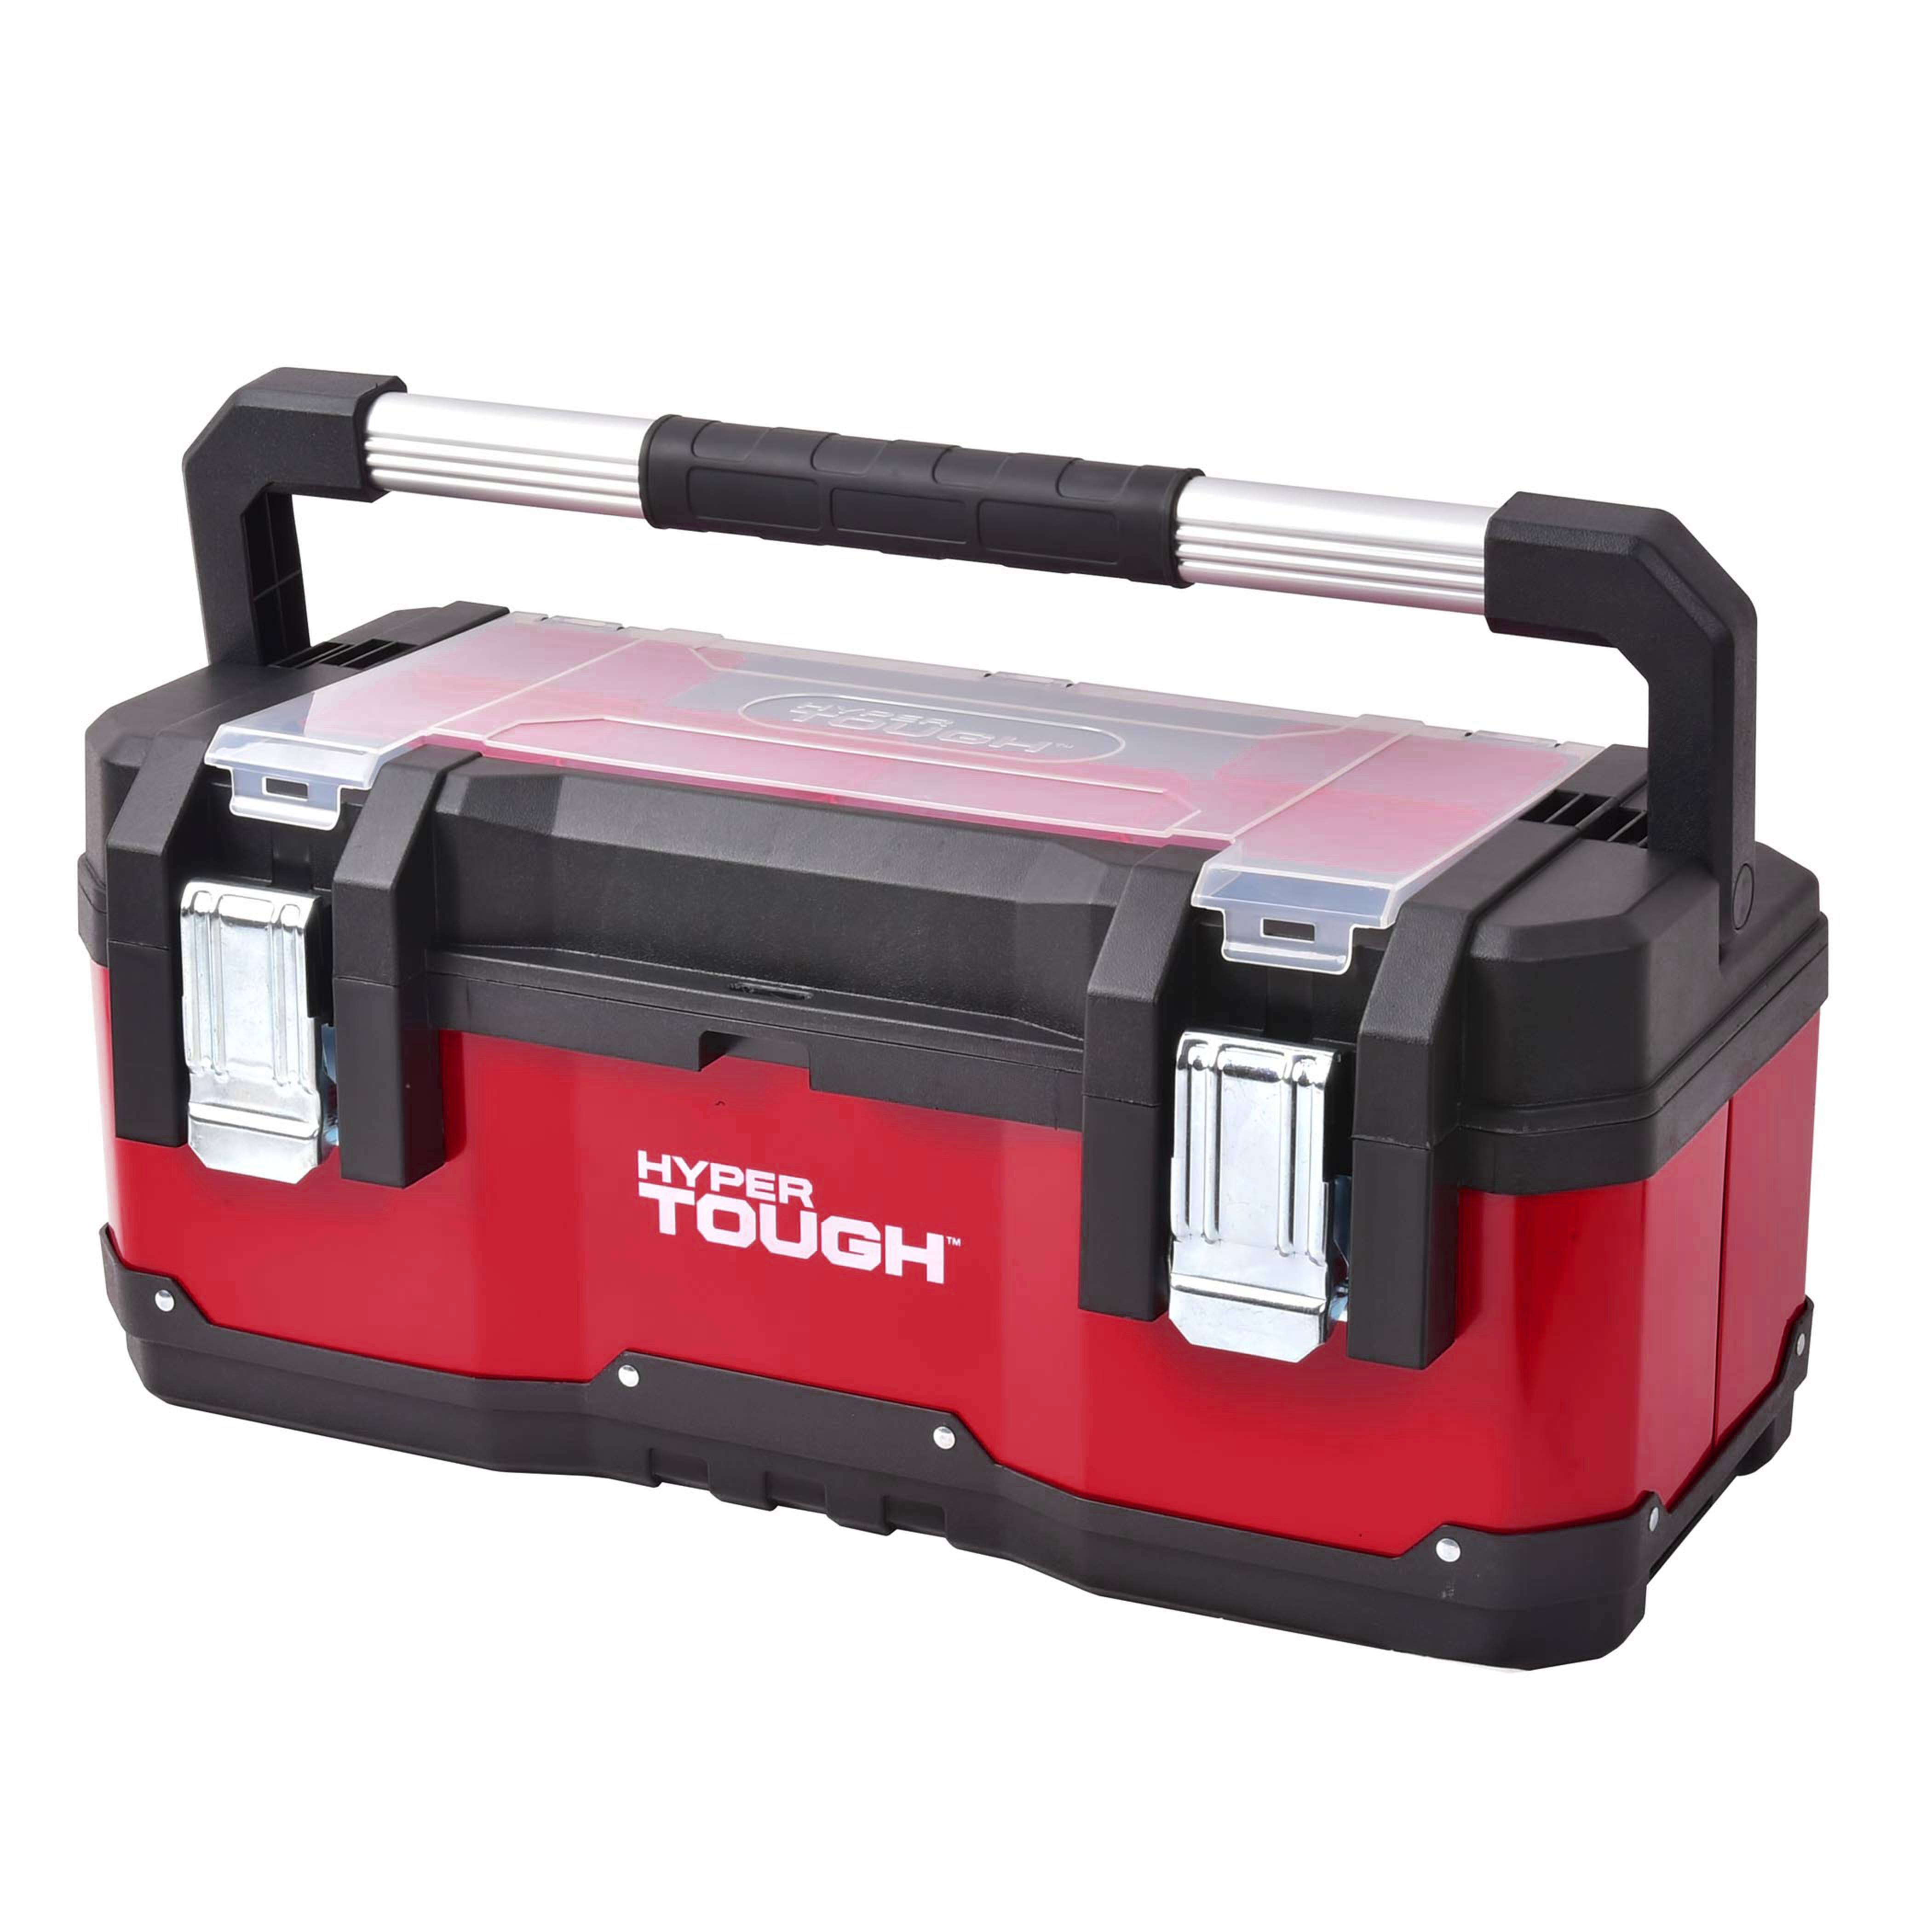 "Hyper Tough 23"" Portable Tool Box w/ organizer trays $25 + Free store pickup at Walmart"